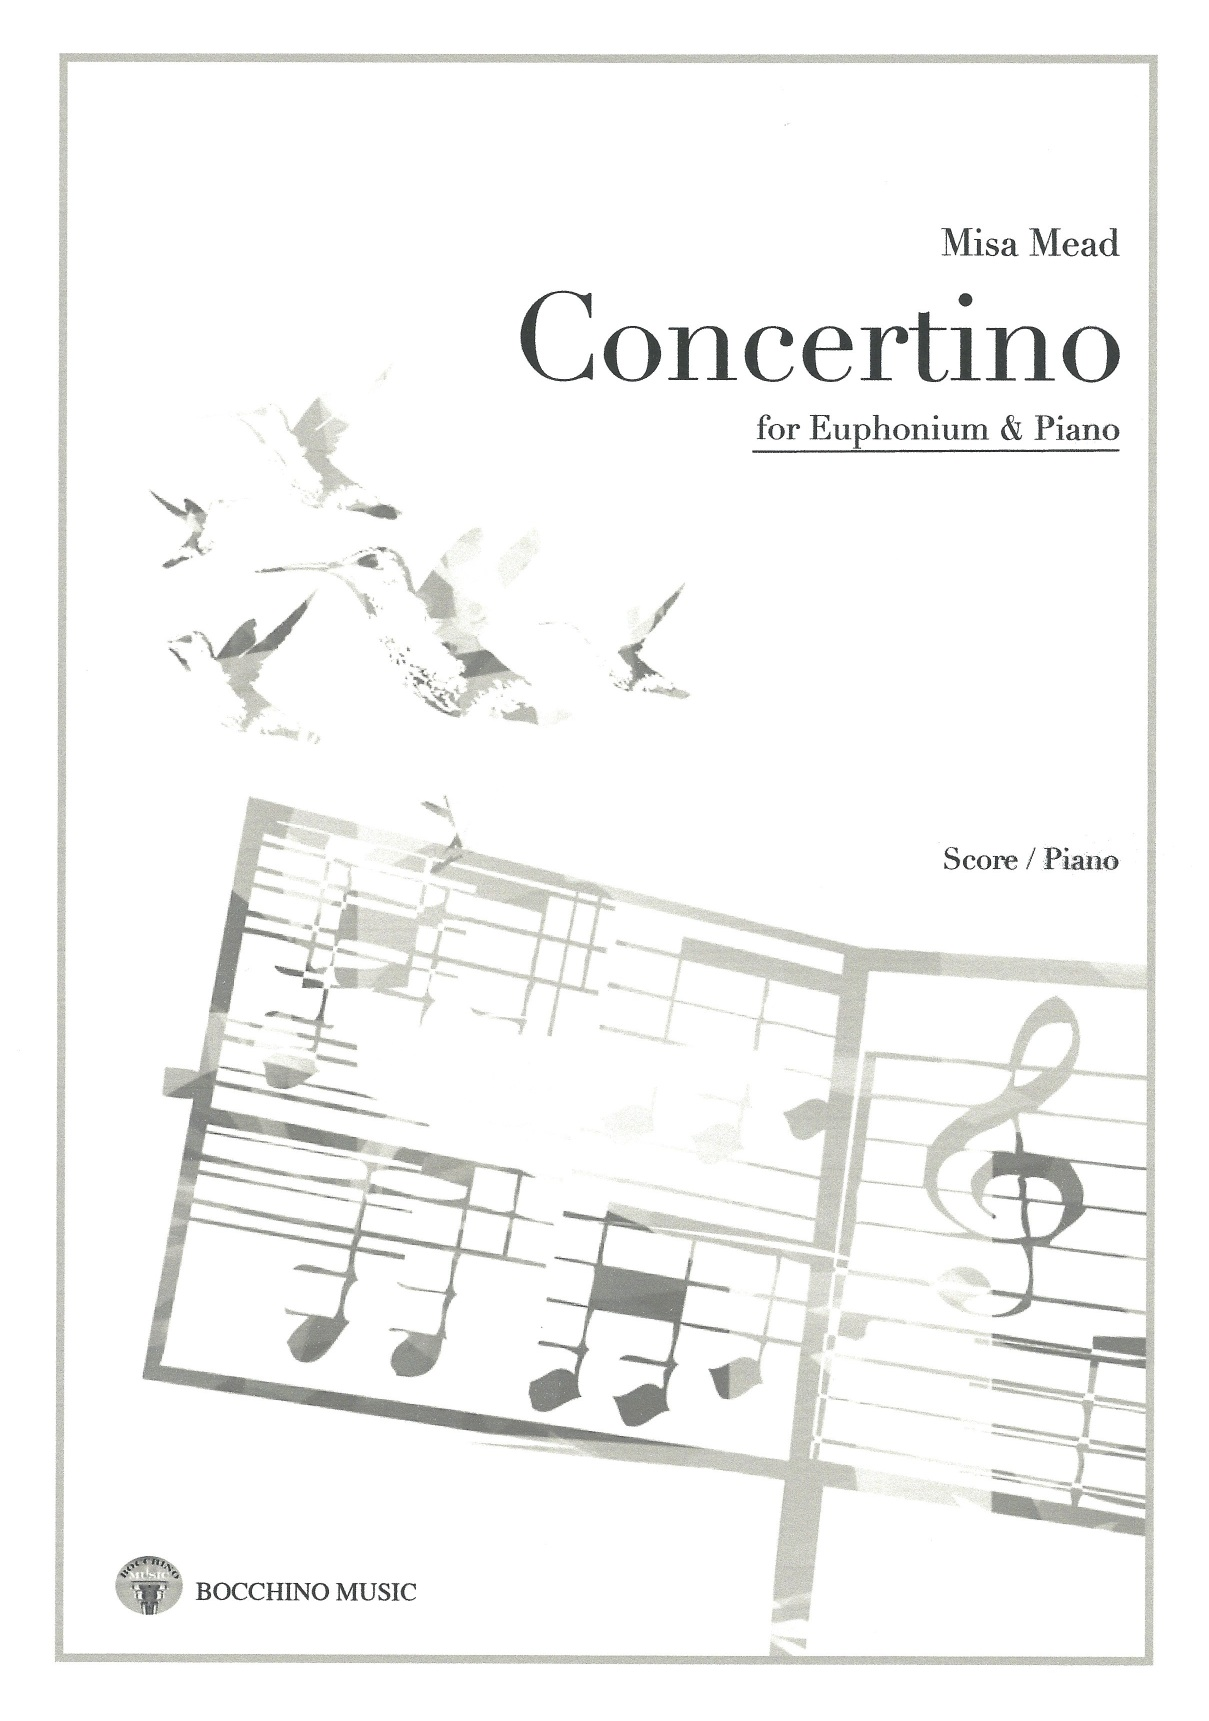 Concertino - Misa Mead - Euphonium and Piano